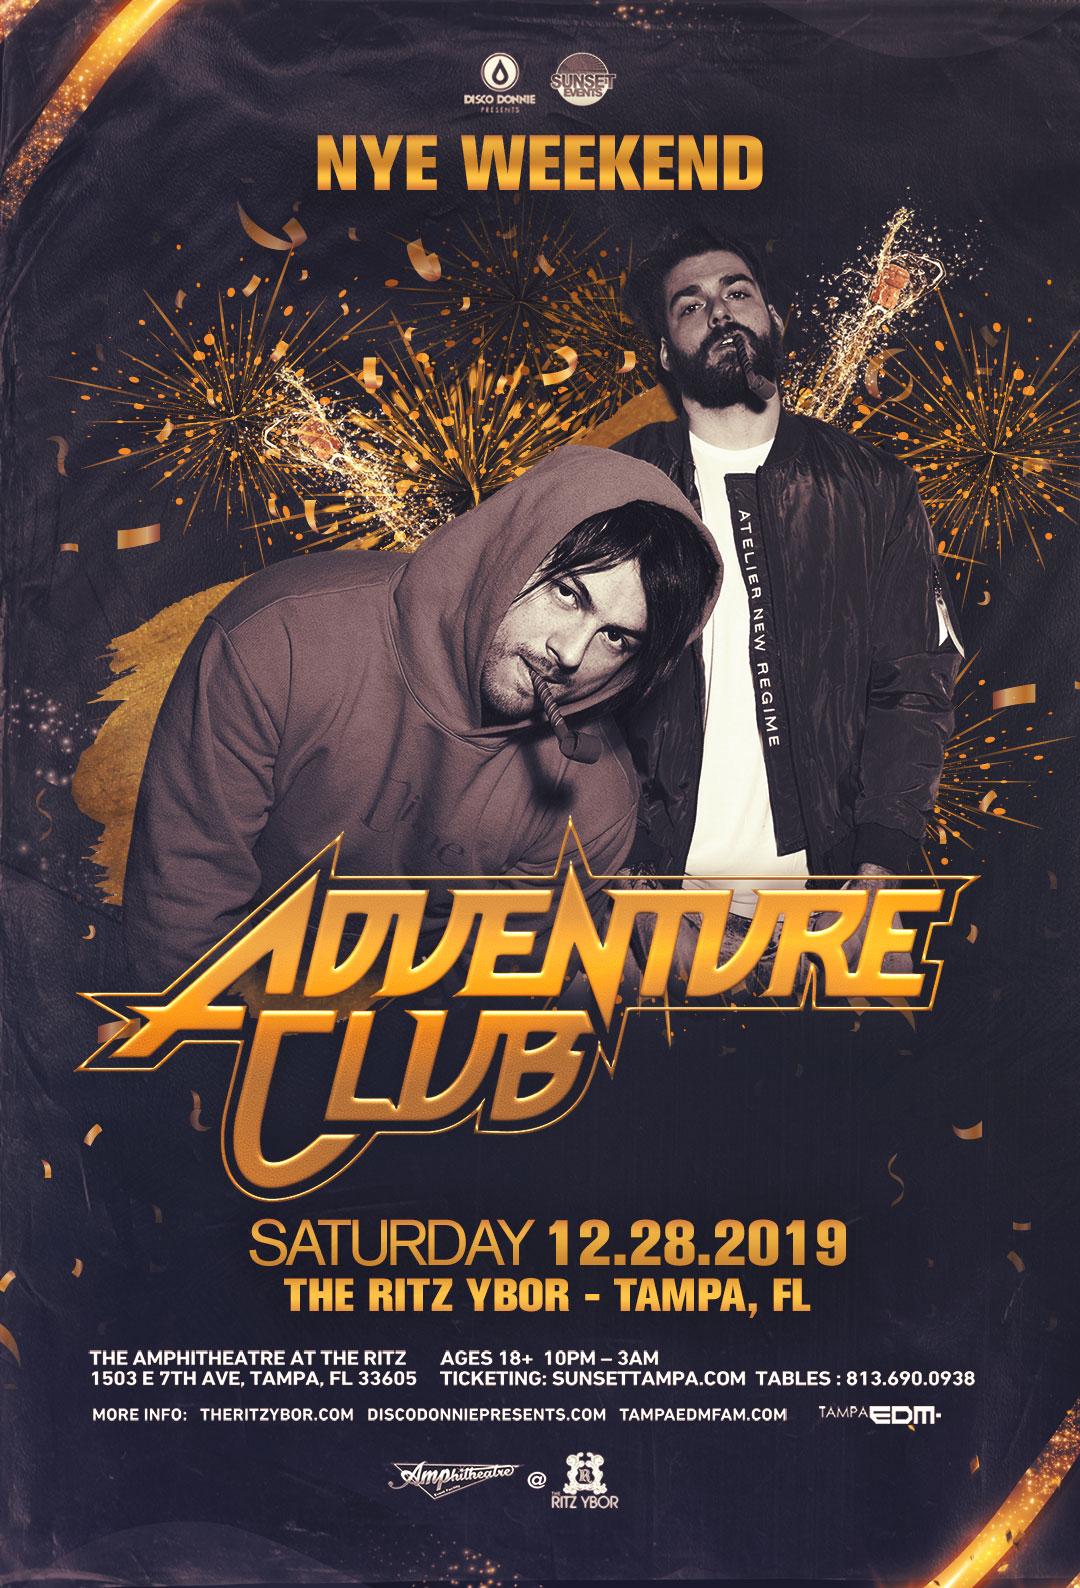 Adventure Club – New Years Eve Weekend – Sunset Saturdays at The RITZ Ybor – 12/28/2019